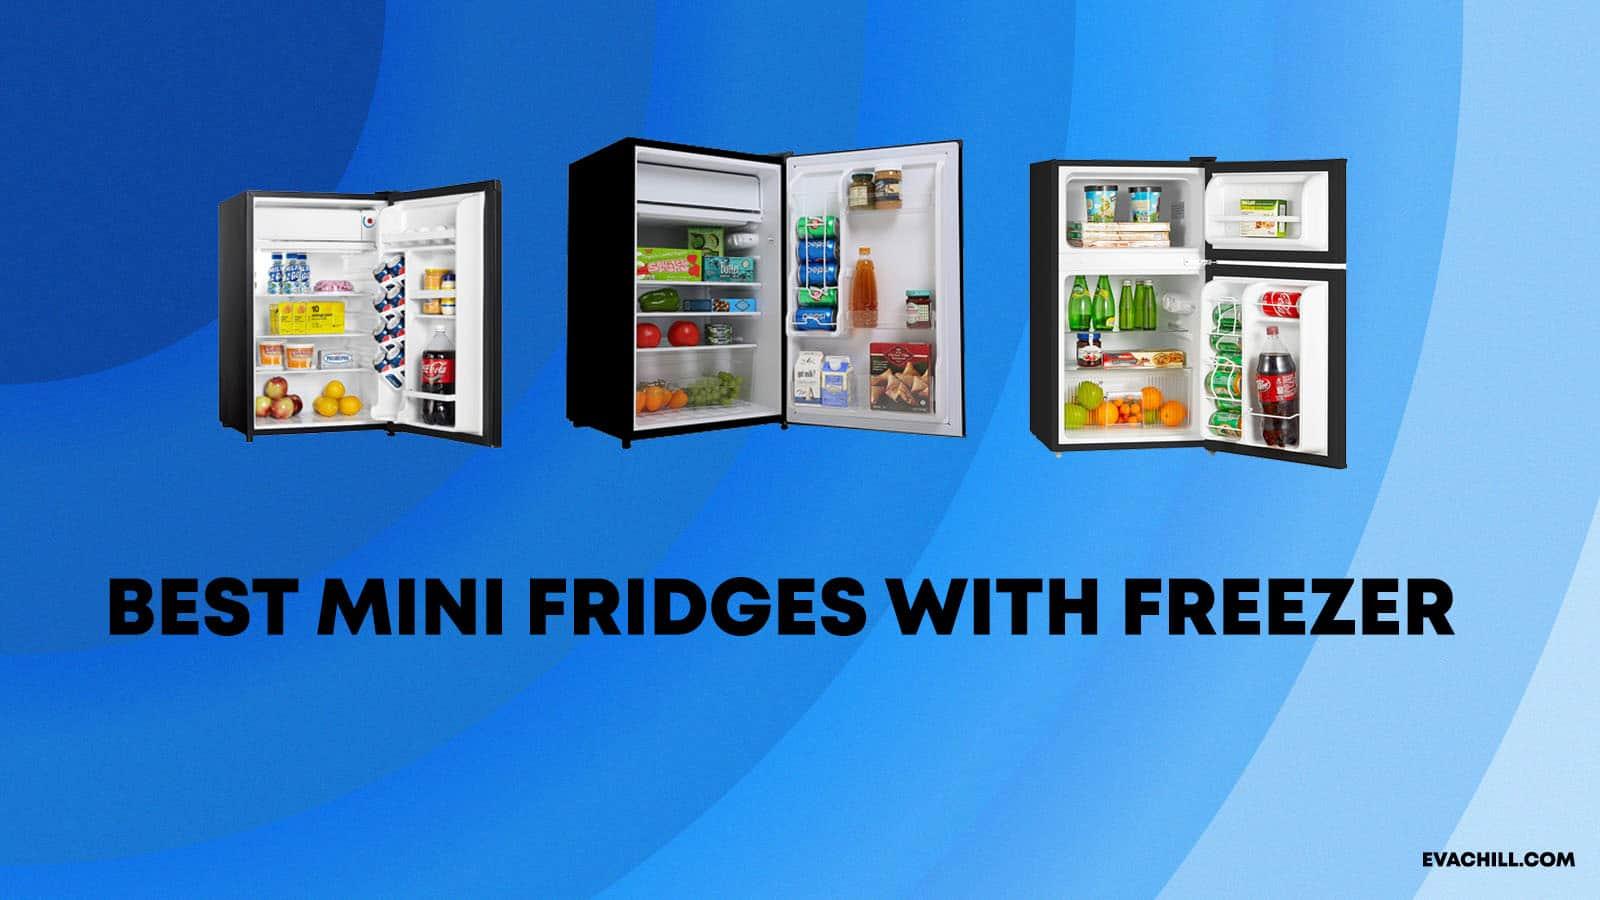 Best Mini Fridges with Freezer